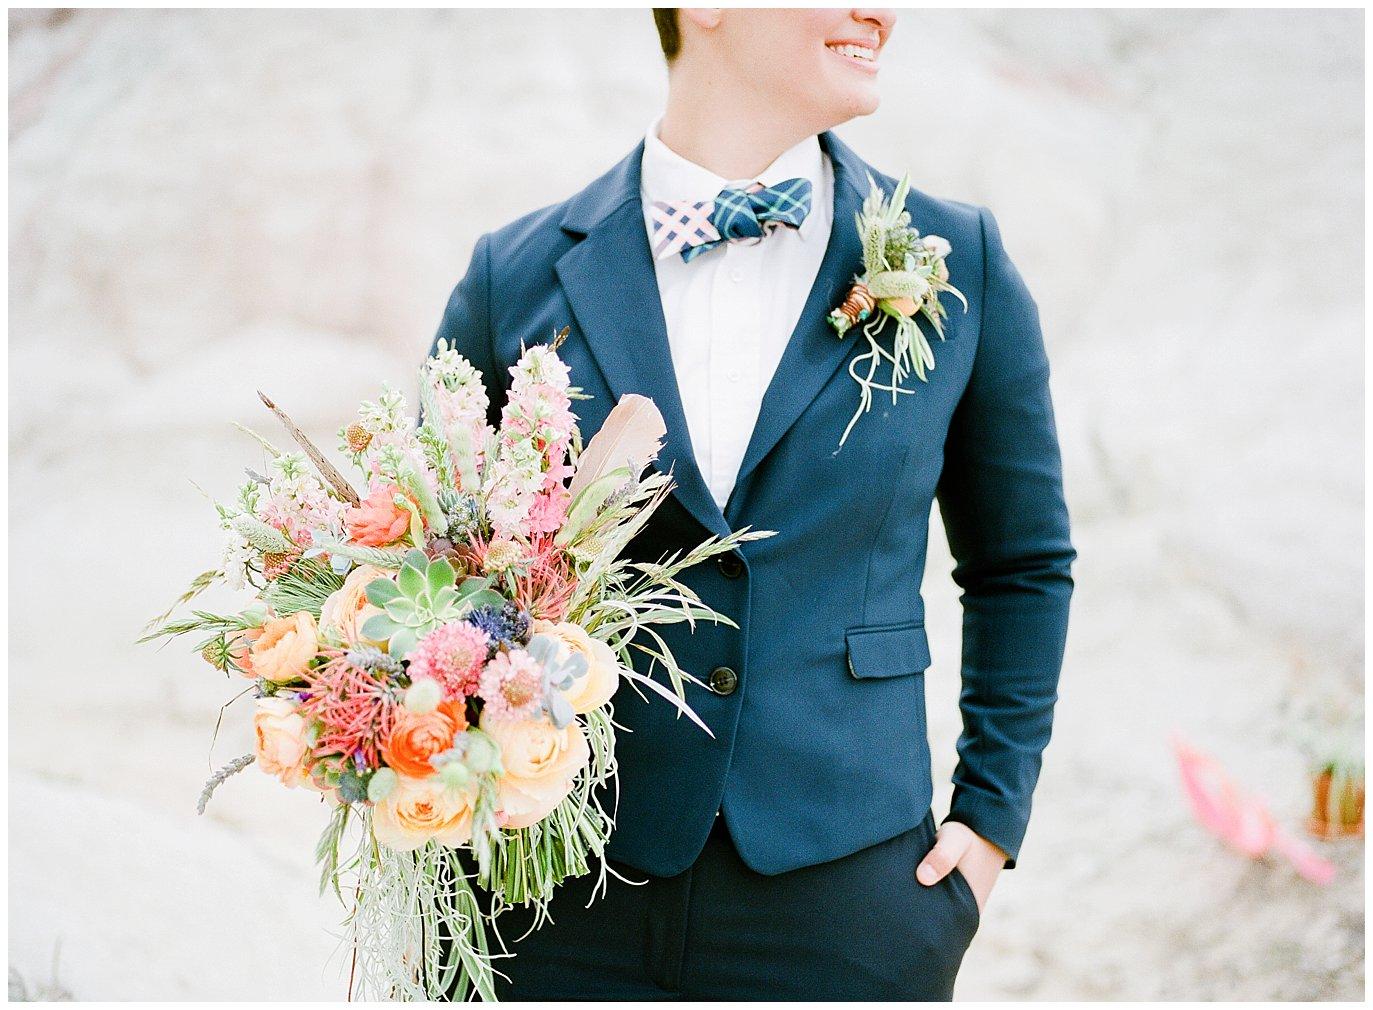 LGBTQ+ wedding suits, bow ties, and shirts